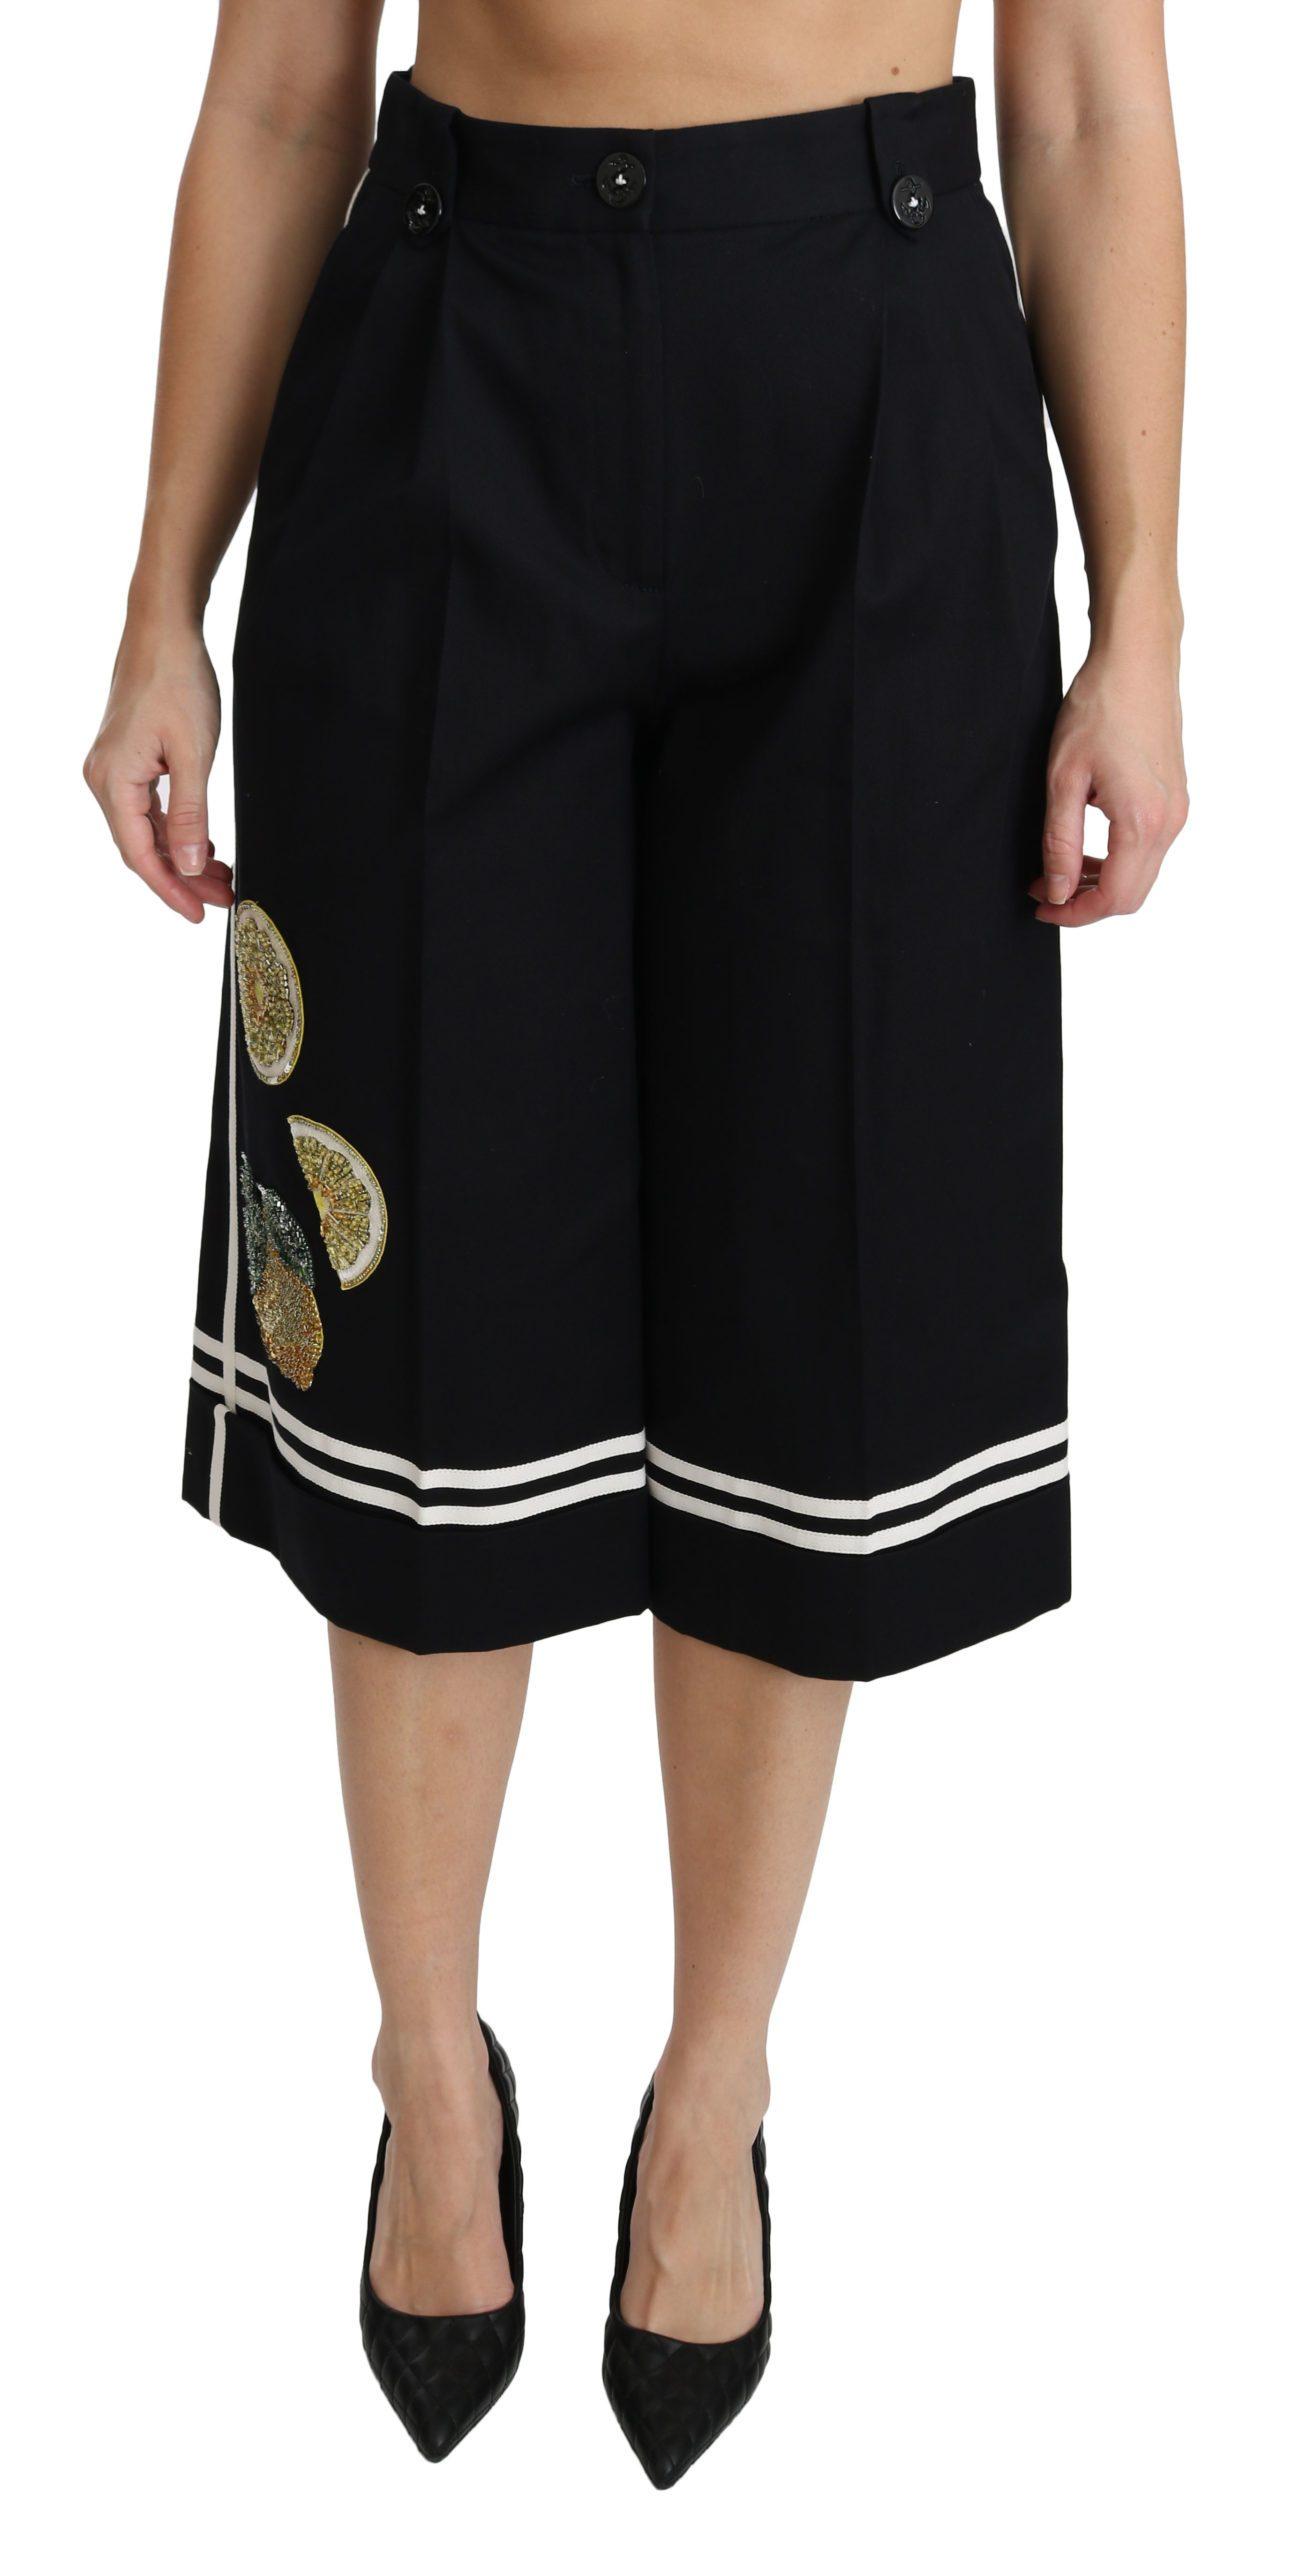 Black Lemon Embellished Palazzo Cropped Pants - IT40|S